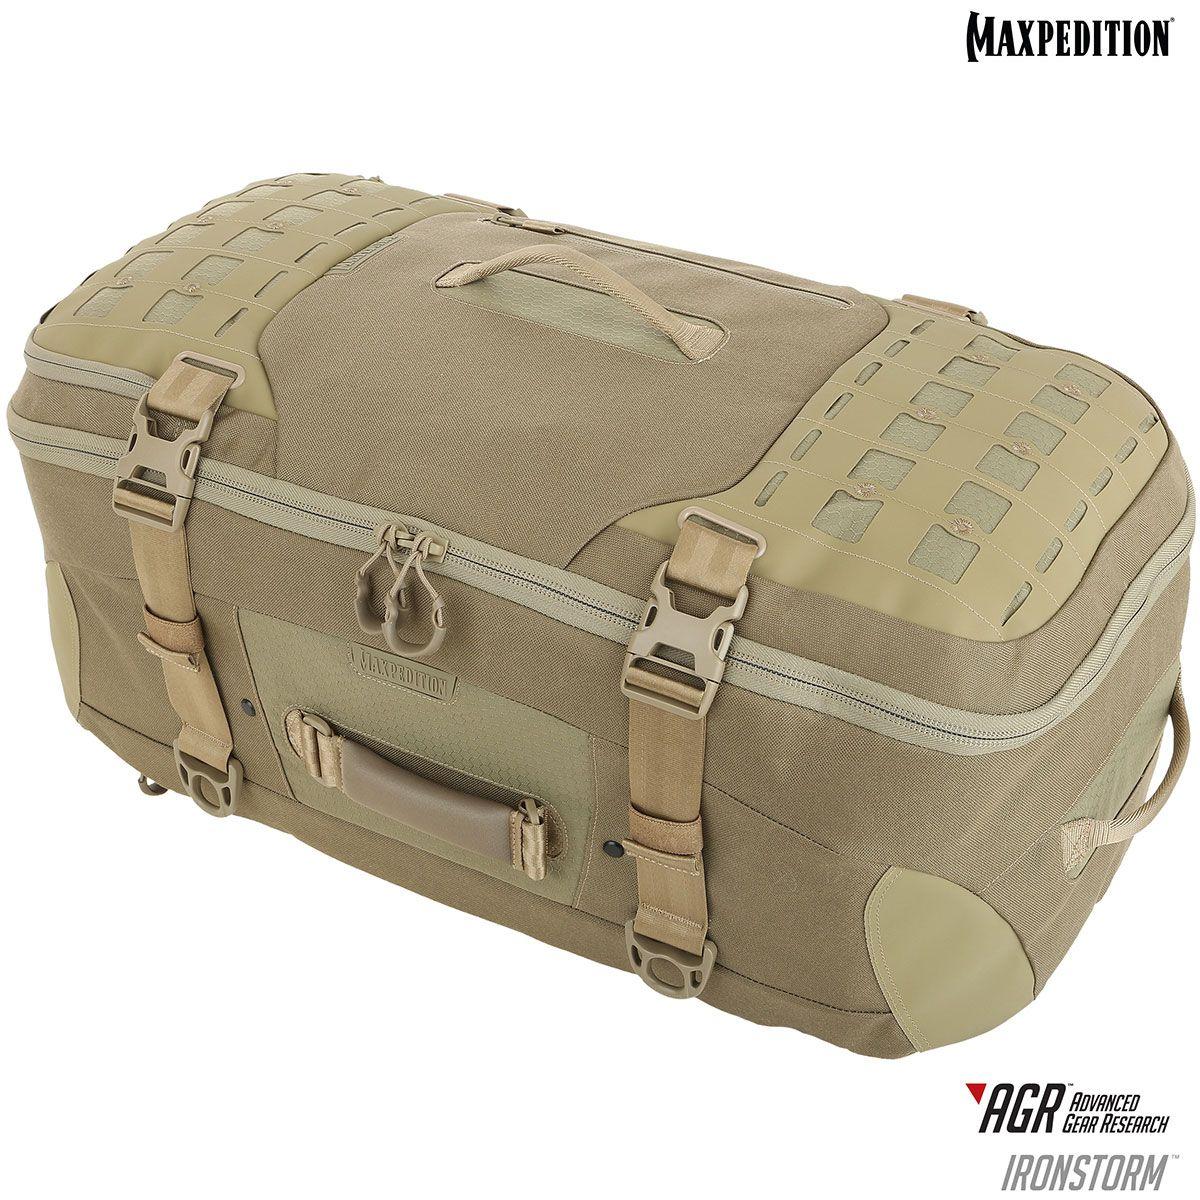 Maxpedition RSMBLK AGR Advanced Gear Research Ironstorm Adventure Travel Bag, Tan